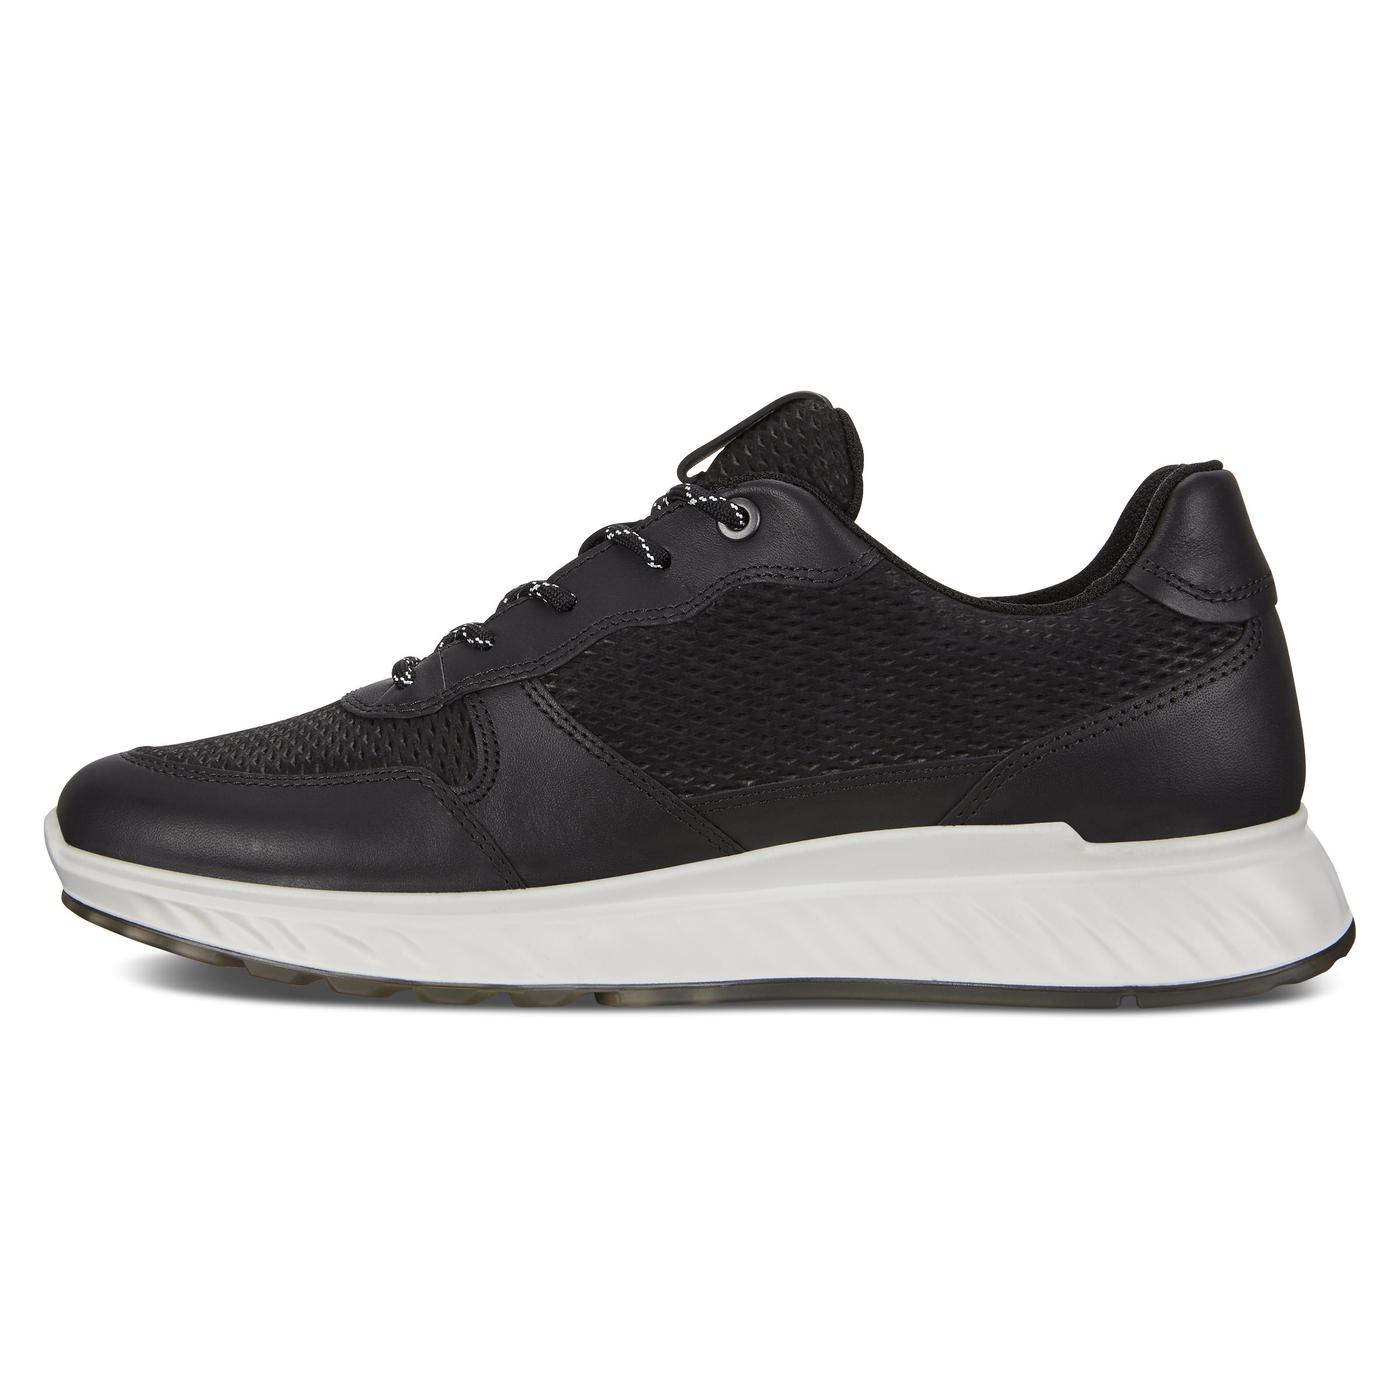 ECCO ST1 Mens Standard Sneaker